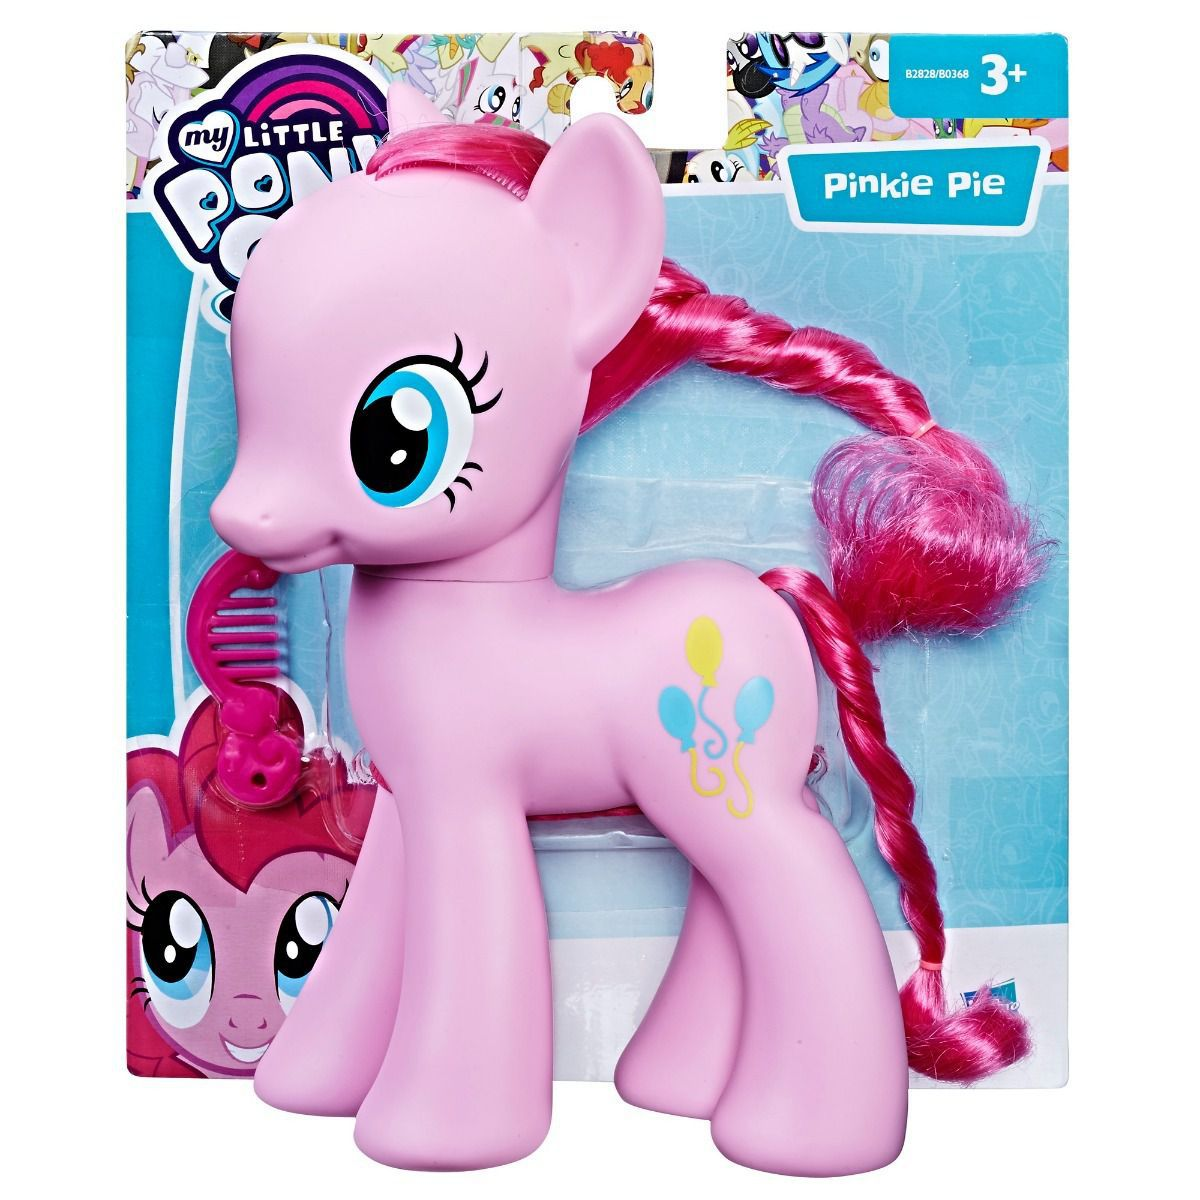 Boneca My Little Pony Friendship 20cm - Hasbro B0368 FULL